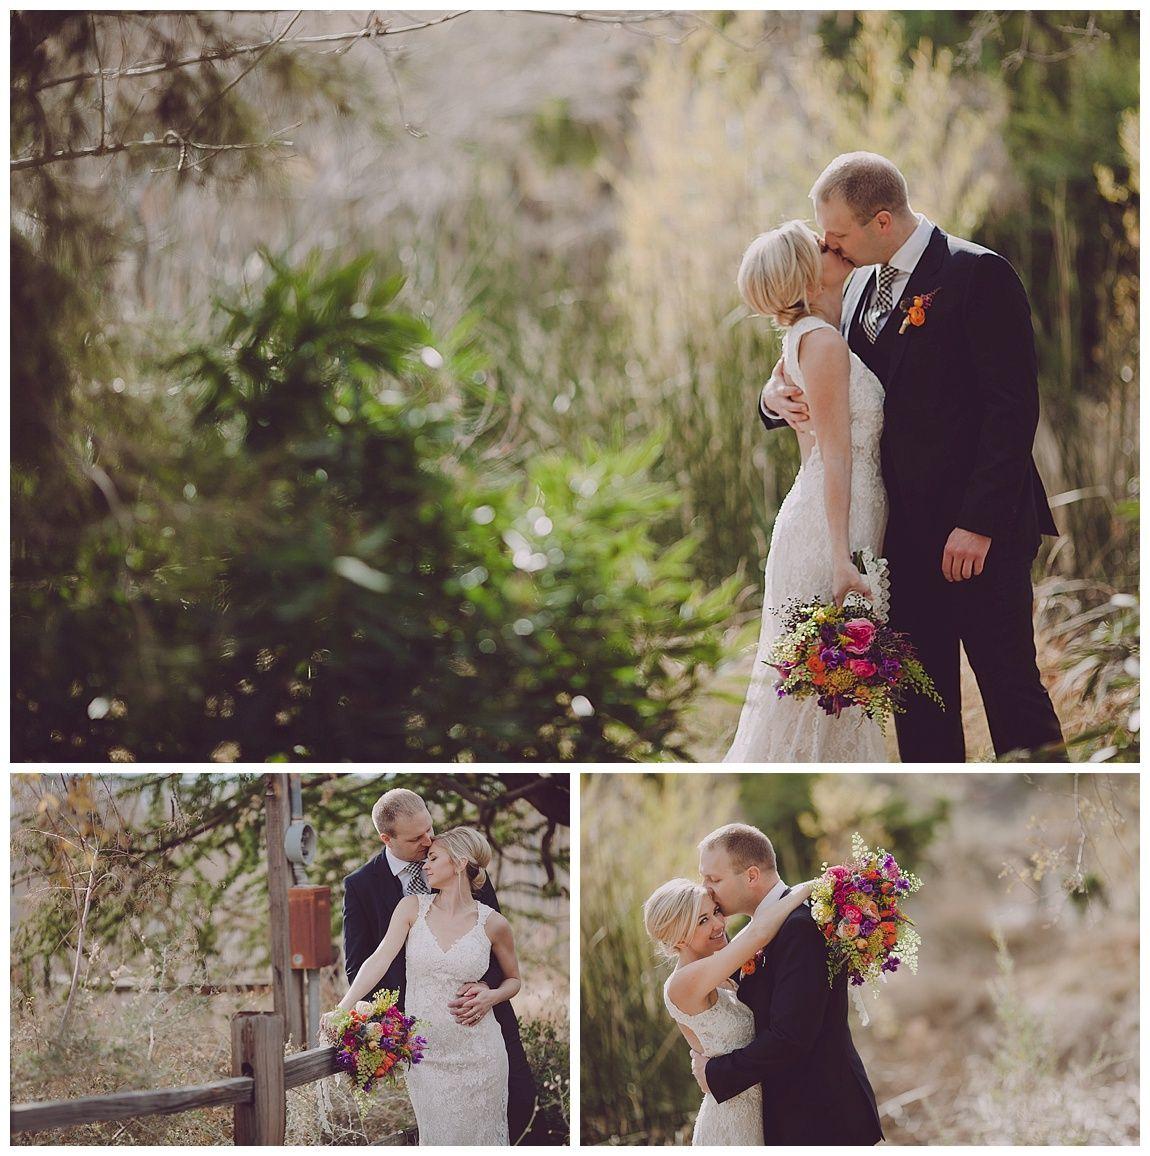 Las Vegas Wedding Planner Mexican Chic wedding Springs Preserve